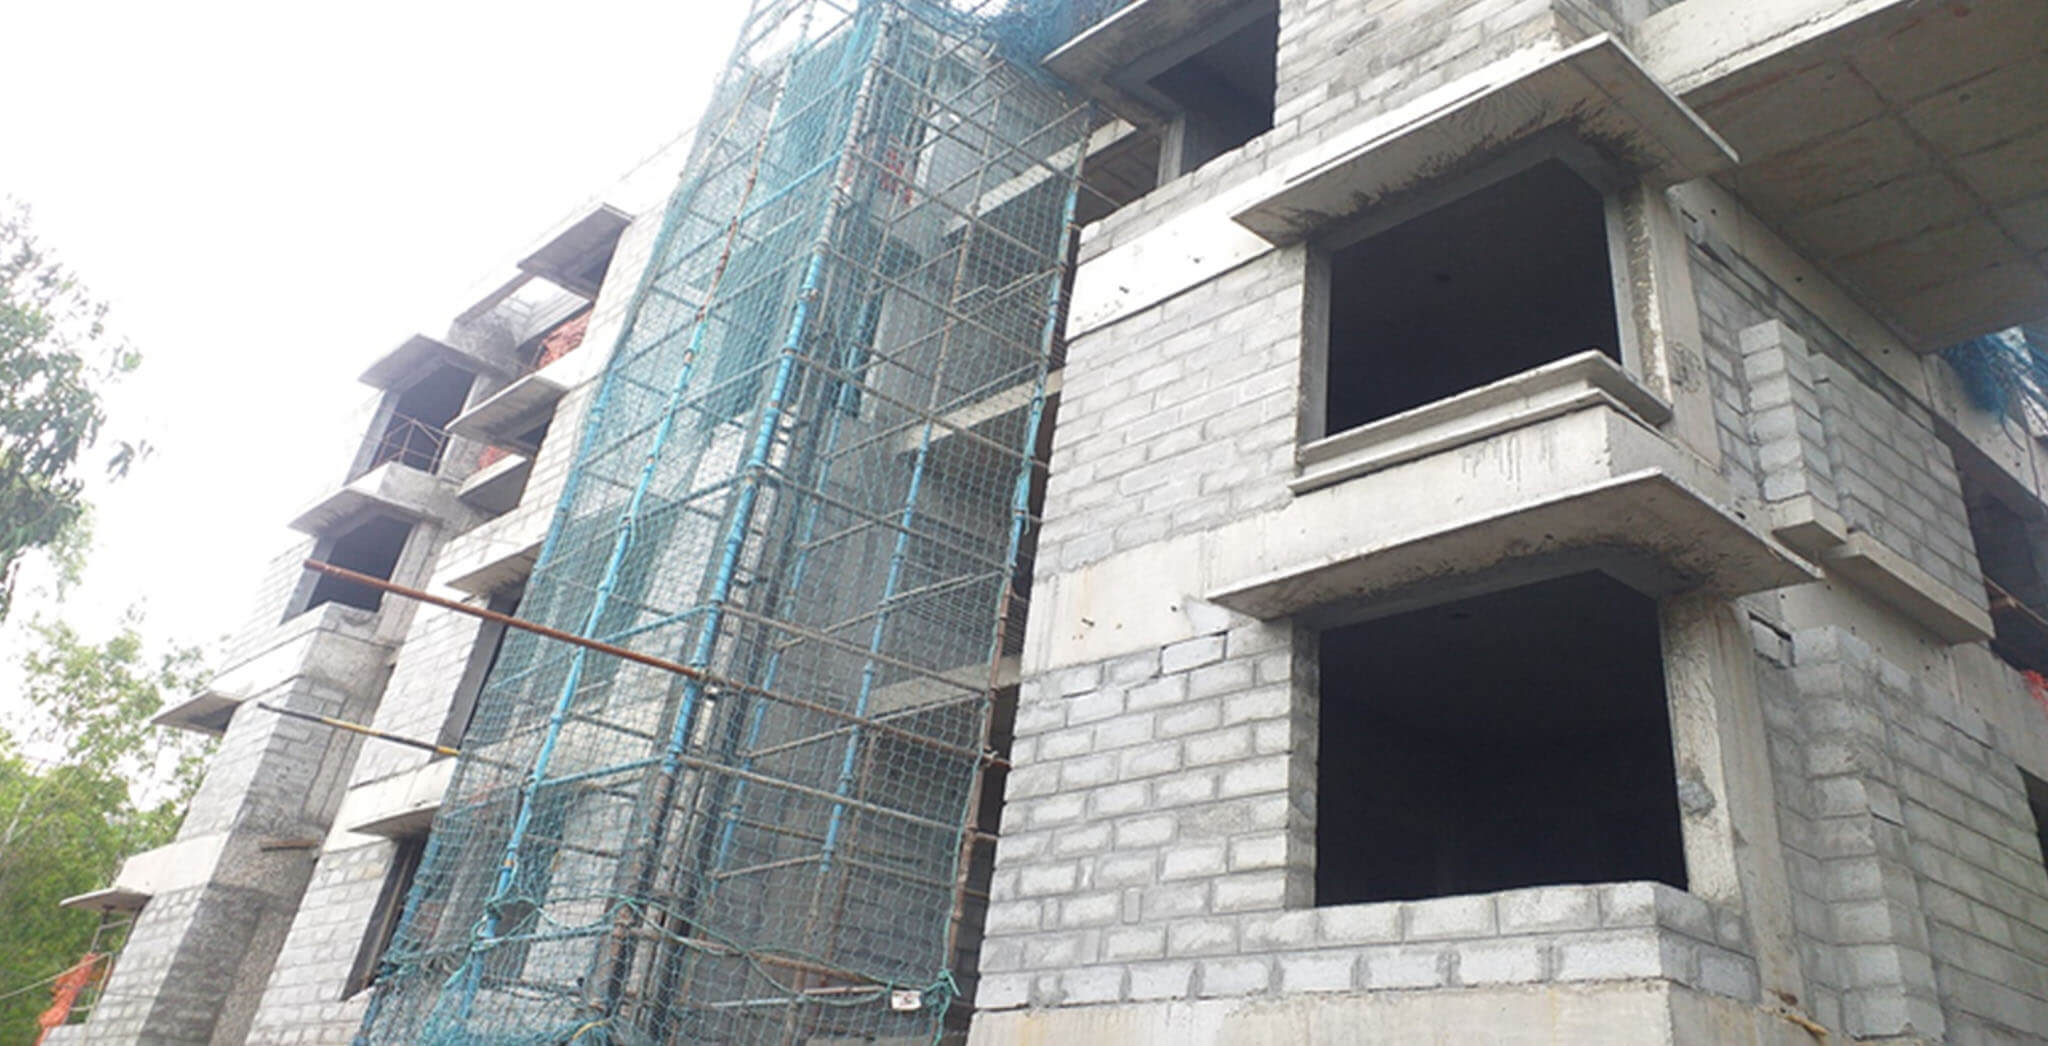 Jul 2020 - West side view: L Block–Blockwork completed, internal plastering work at 4th floor in progress.